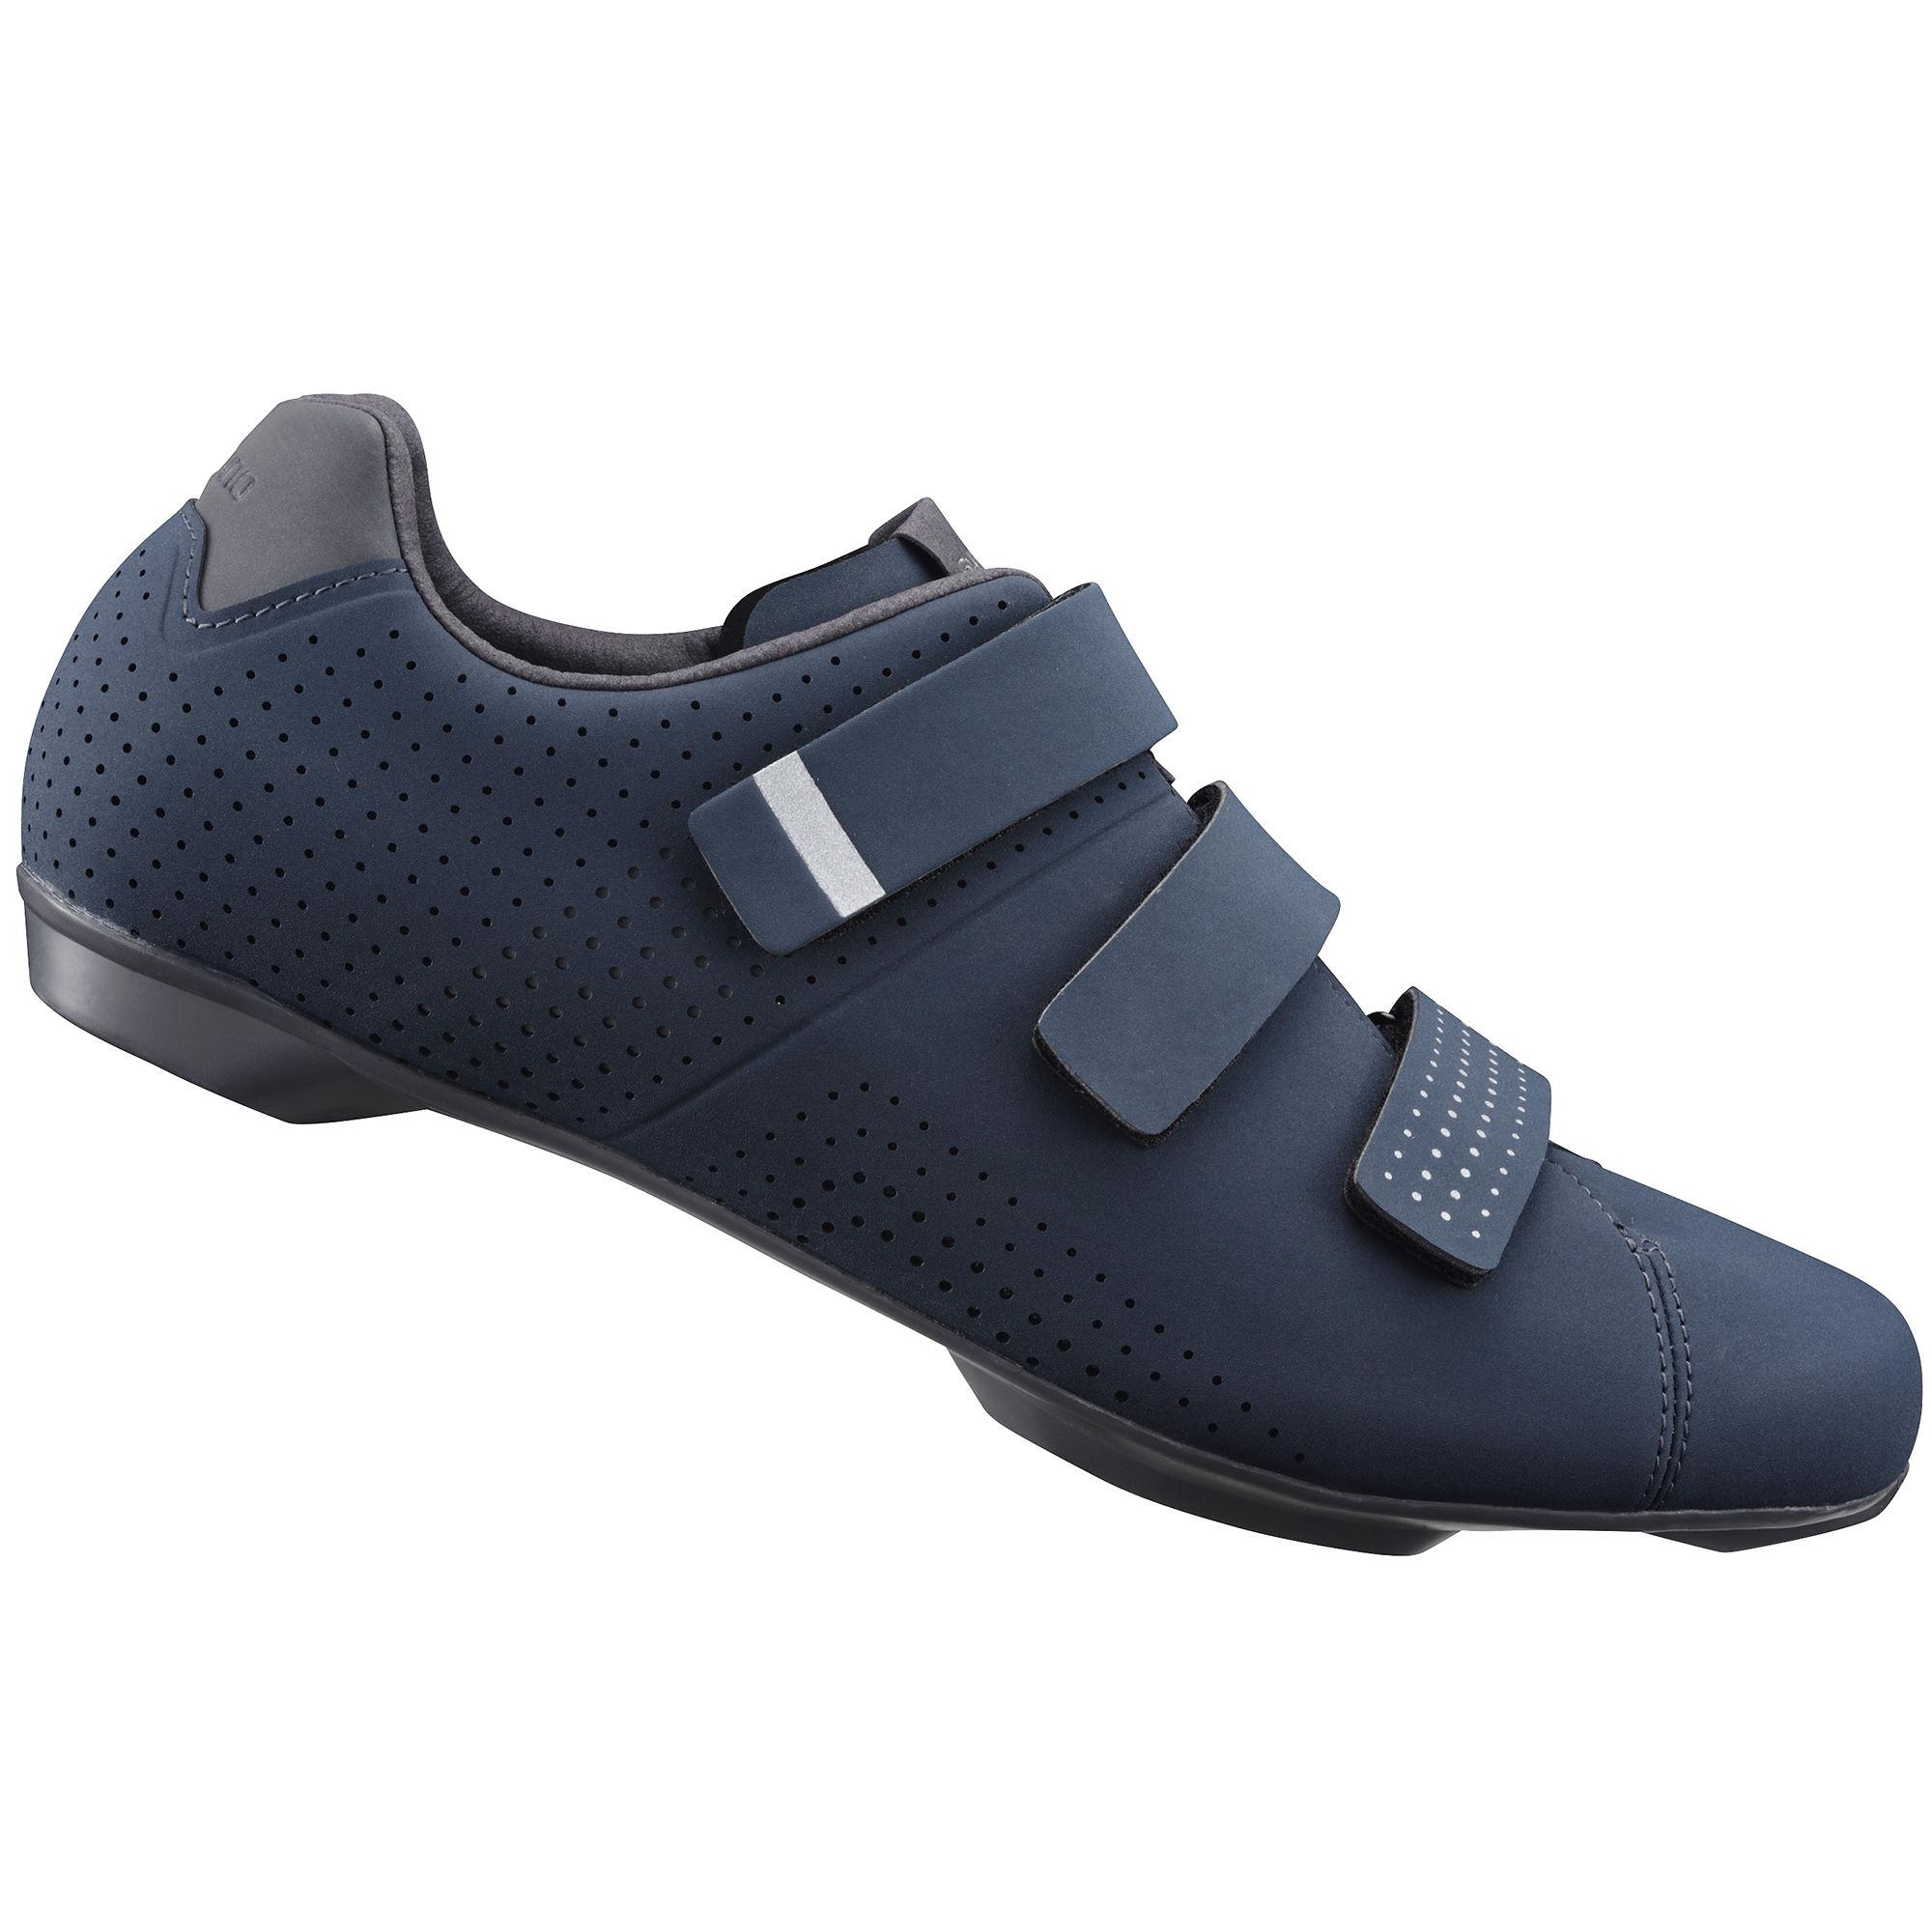 Shimano RT5 SPD Touring Shoes - 2018